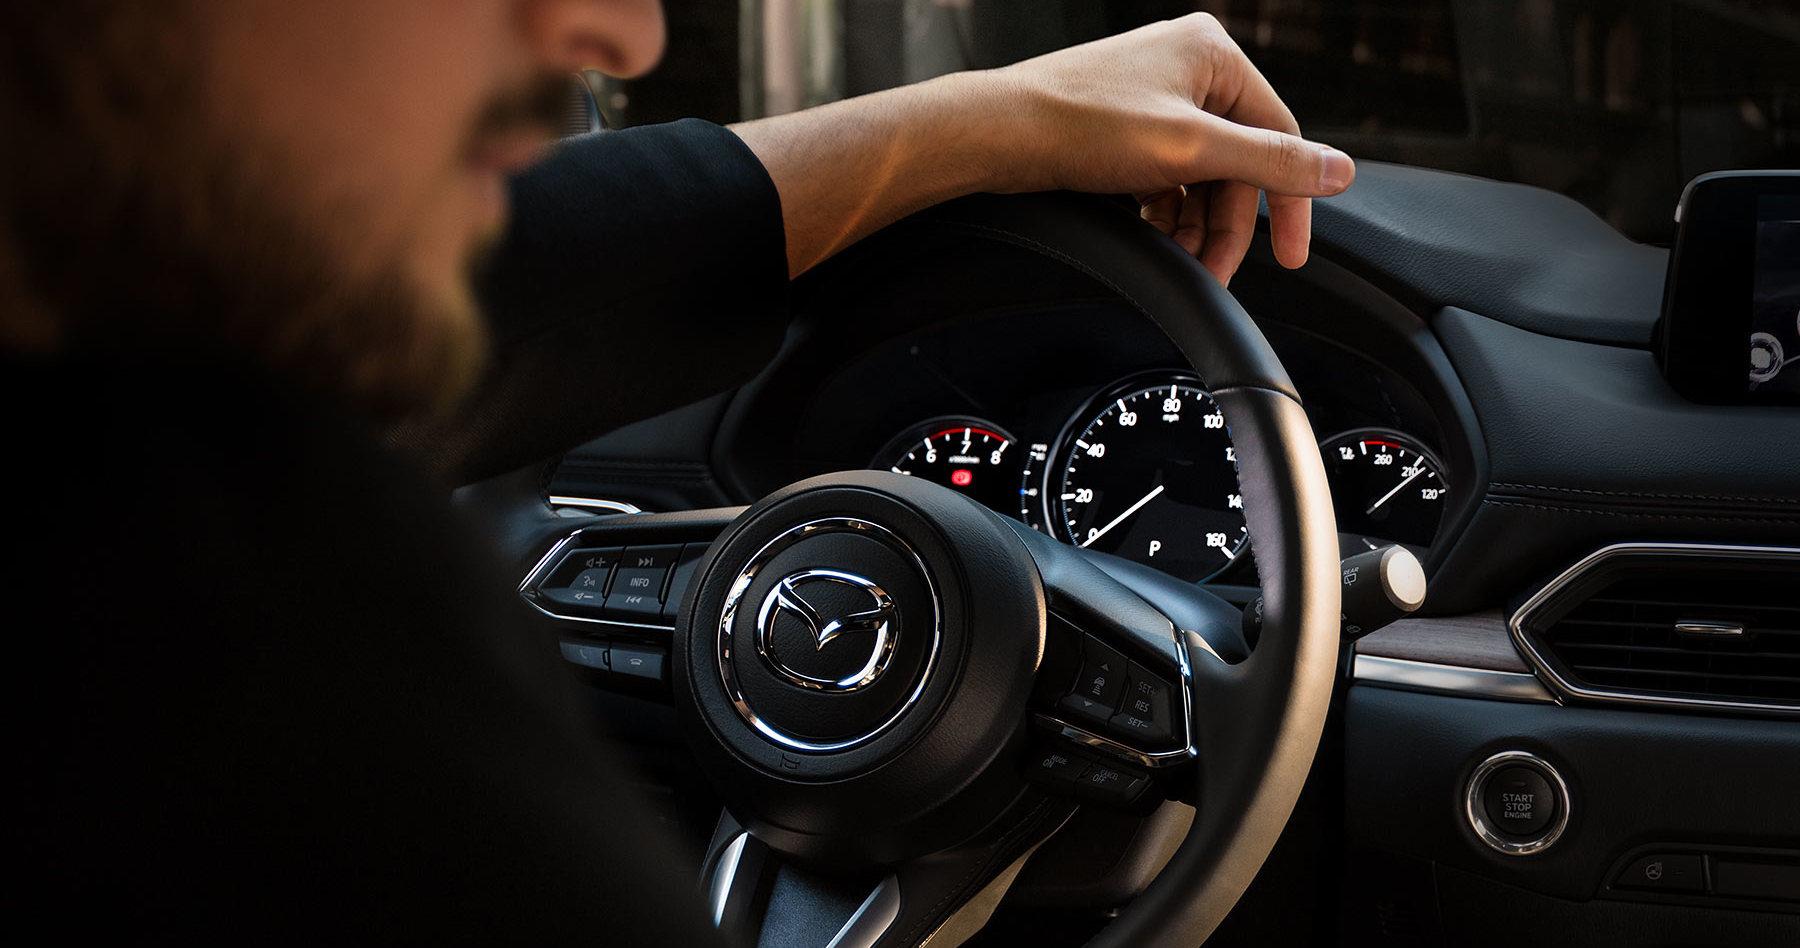 2020 MAZDA CX-5 Steering Wheel-Mounted Controls